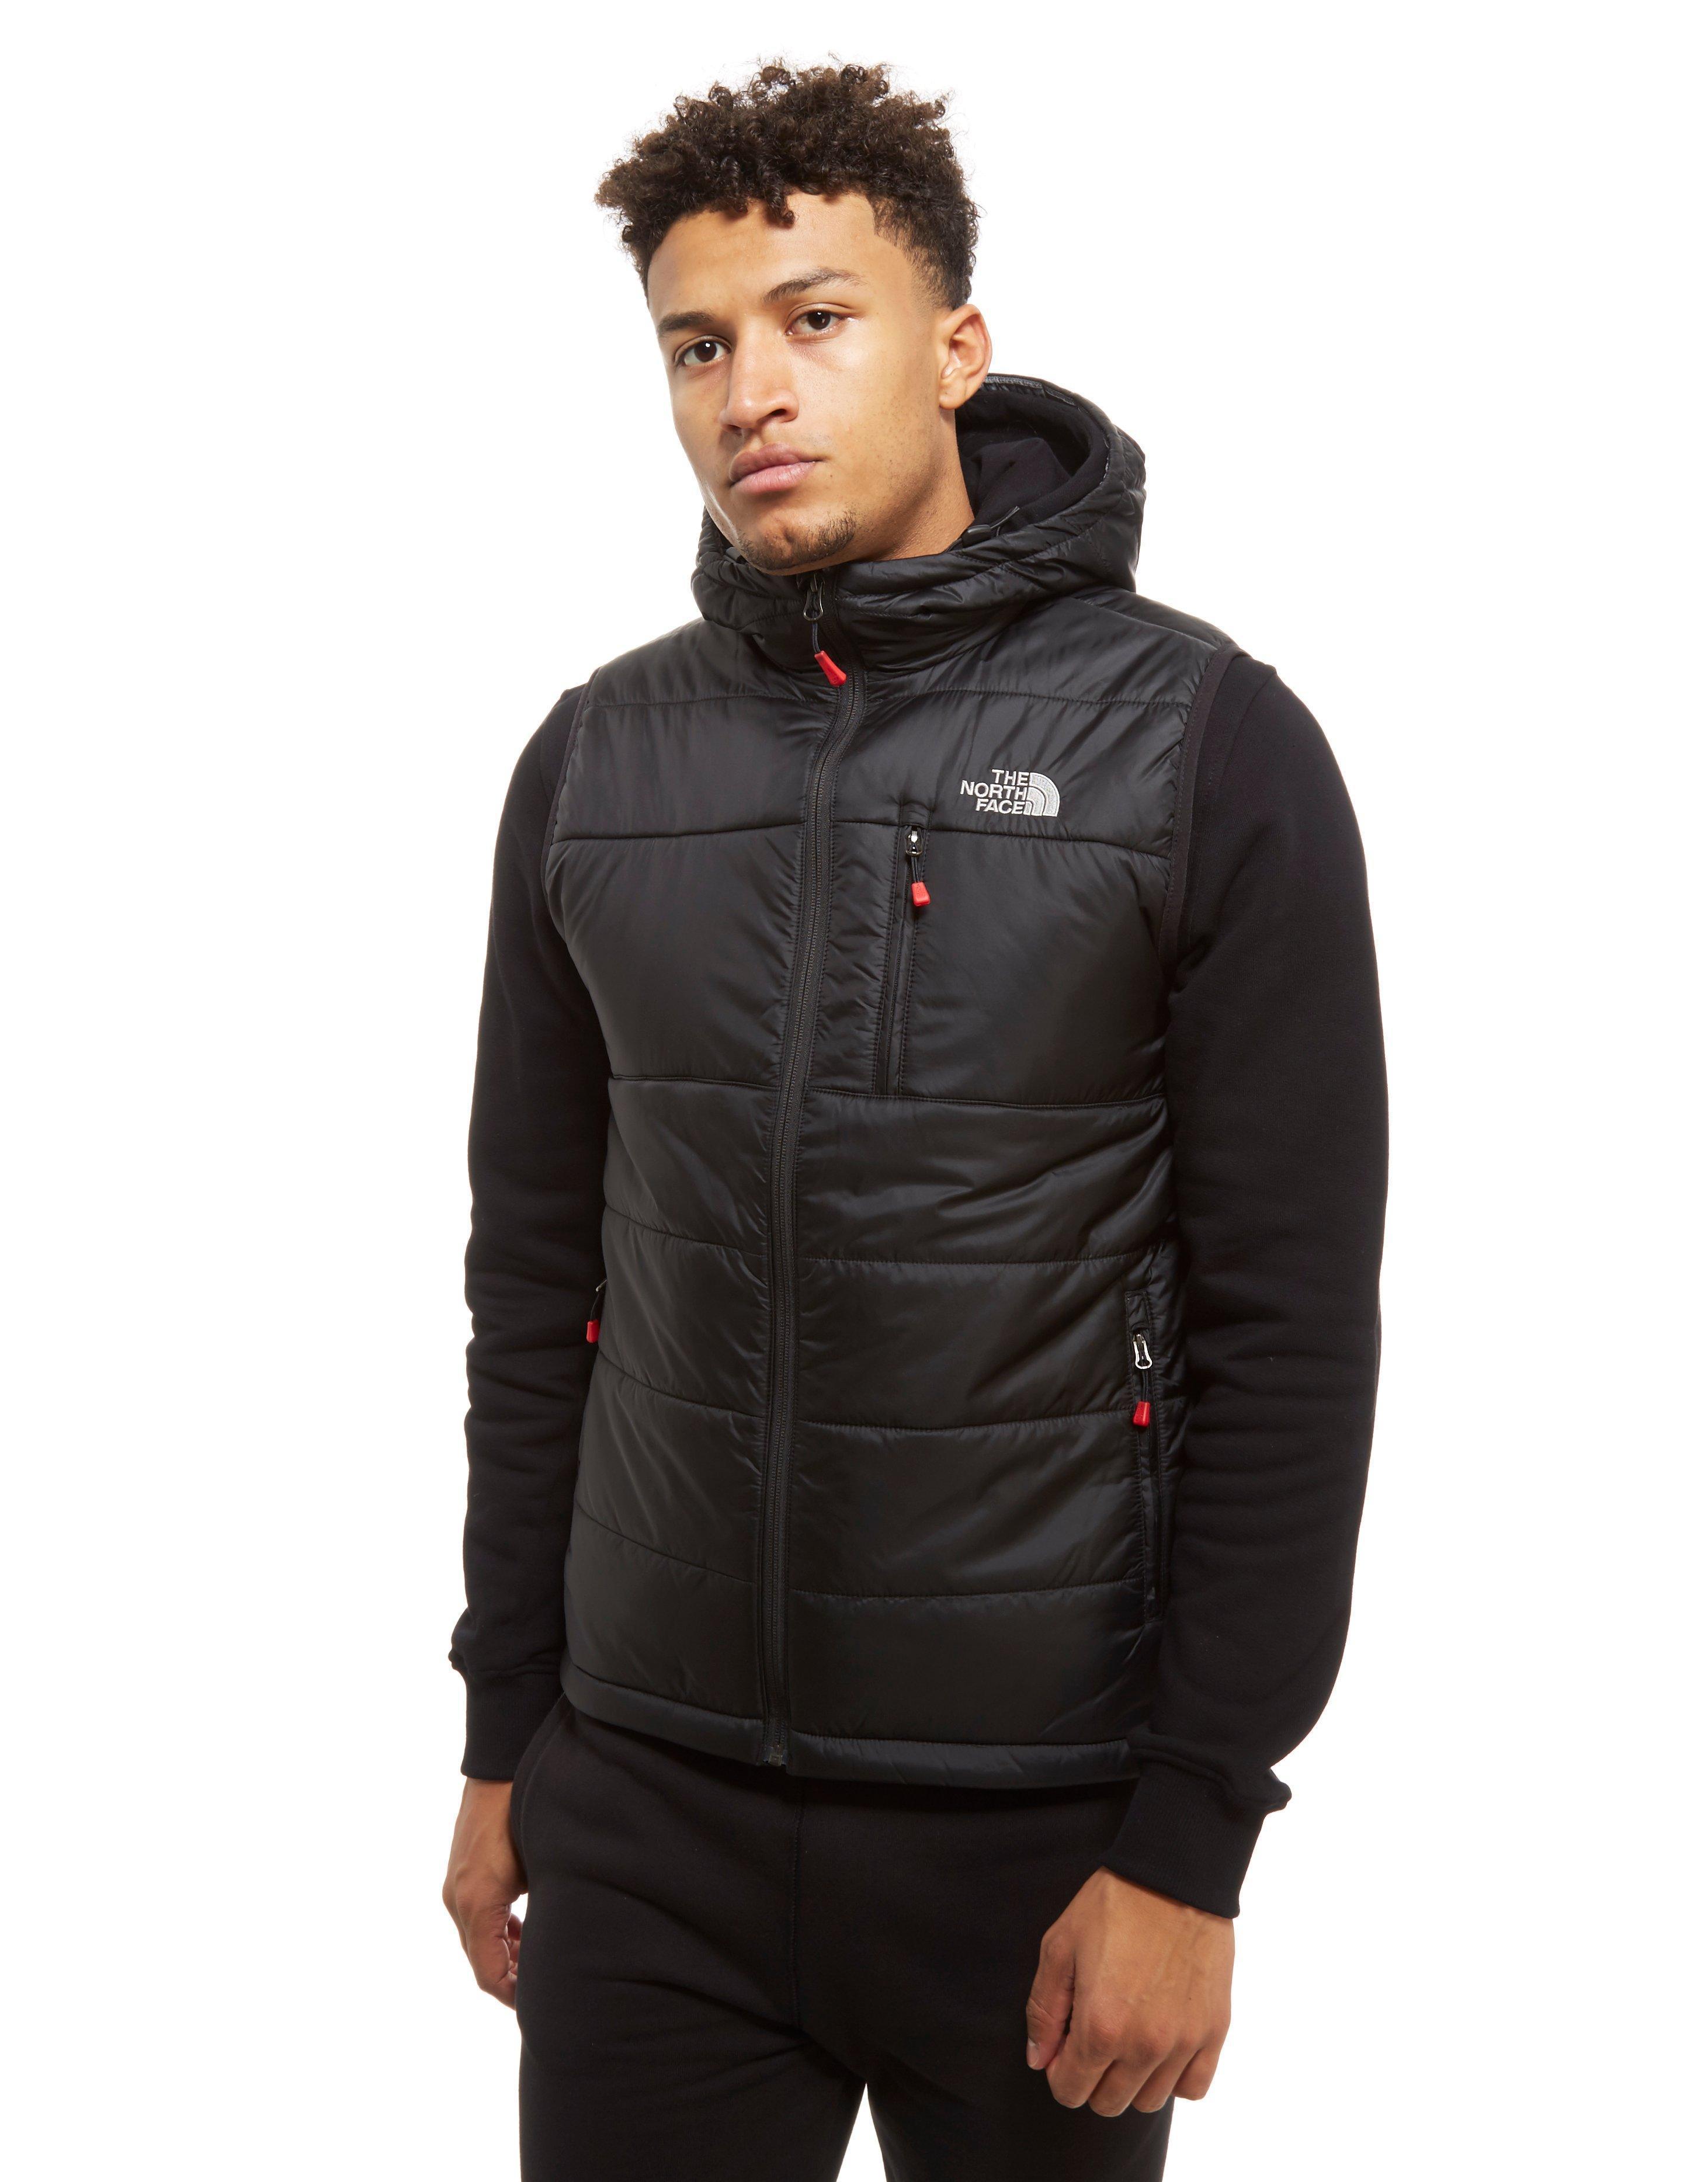 95c8be02f4 ... jacket the north face khotan The North Face. Mens Black Khotan Gilet ...